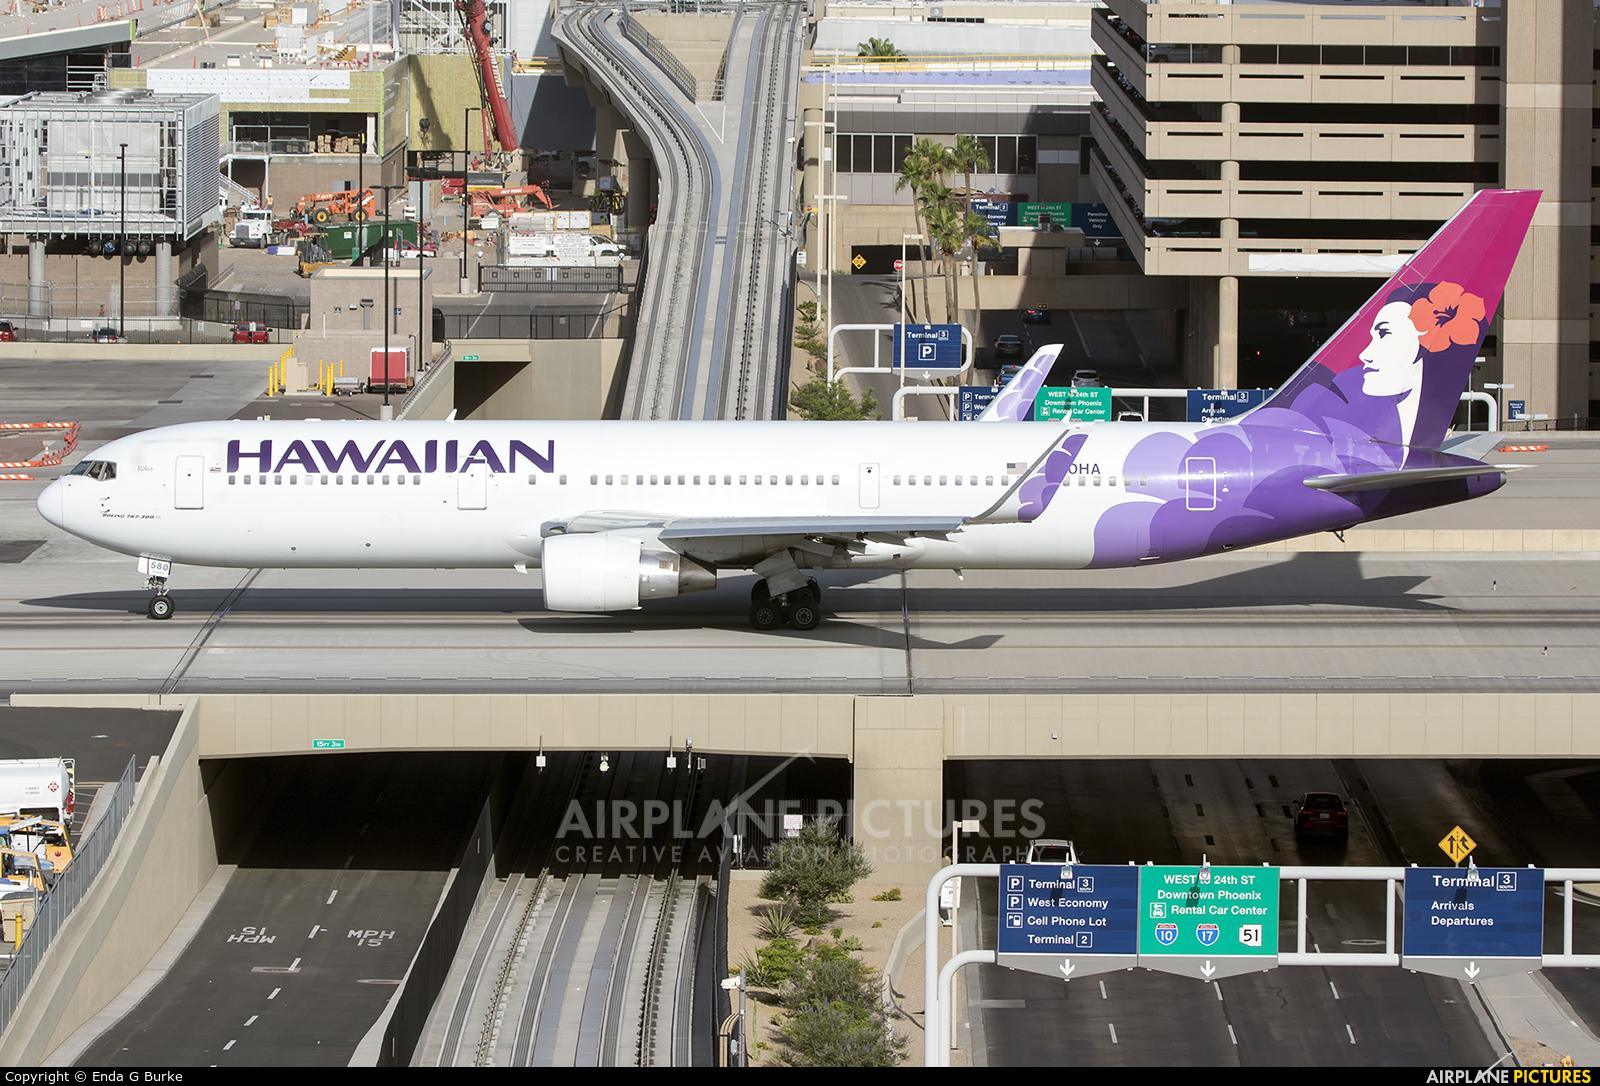 Hawaiian Airlines N580HA aircraft at Phoenix - Sky Harbor Intl